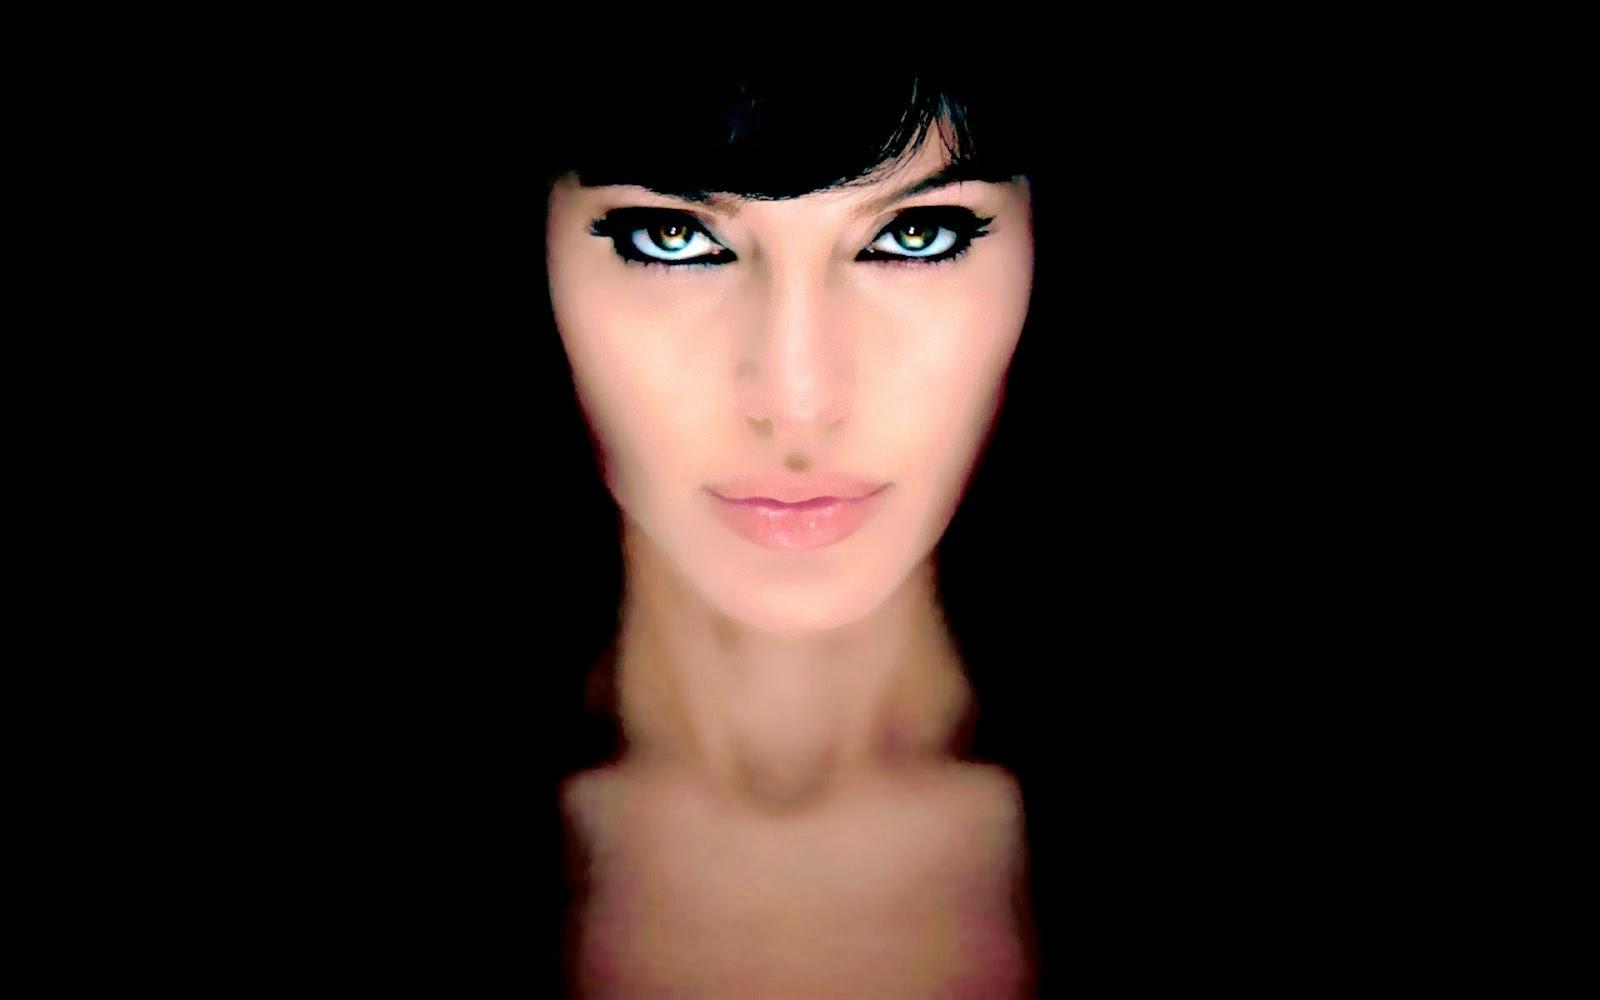 Angelina Jolie Wallpaper HD